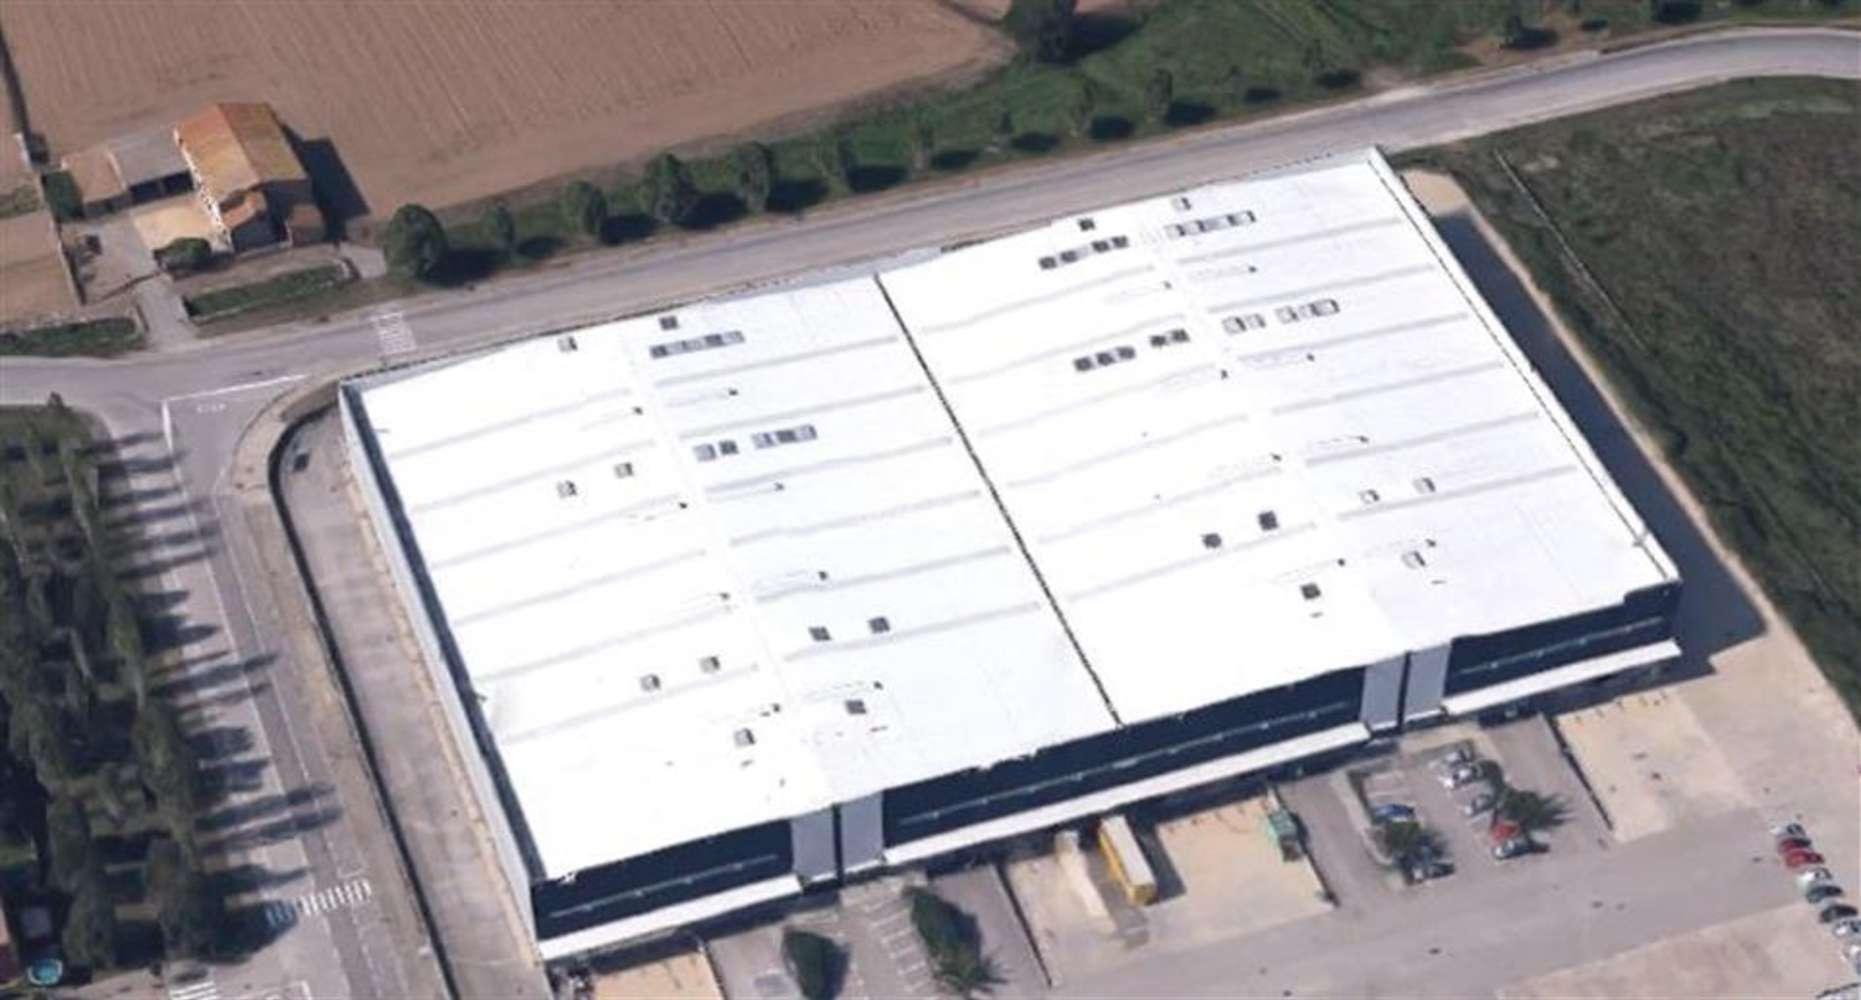 Naves industriales y logísticas Celrà, 17460 - Nave Logistica - B0401 - PI CELRÀ - 12810